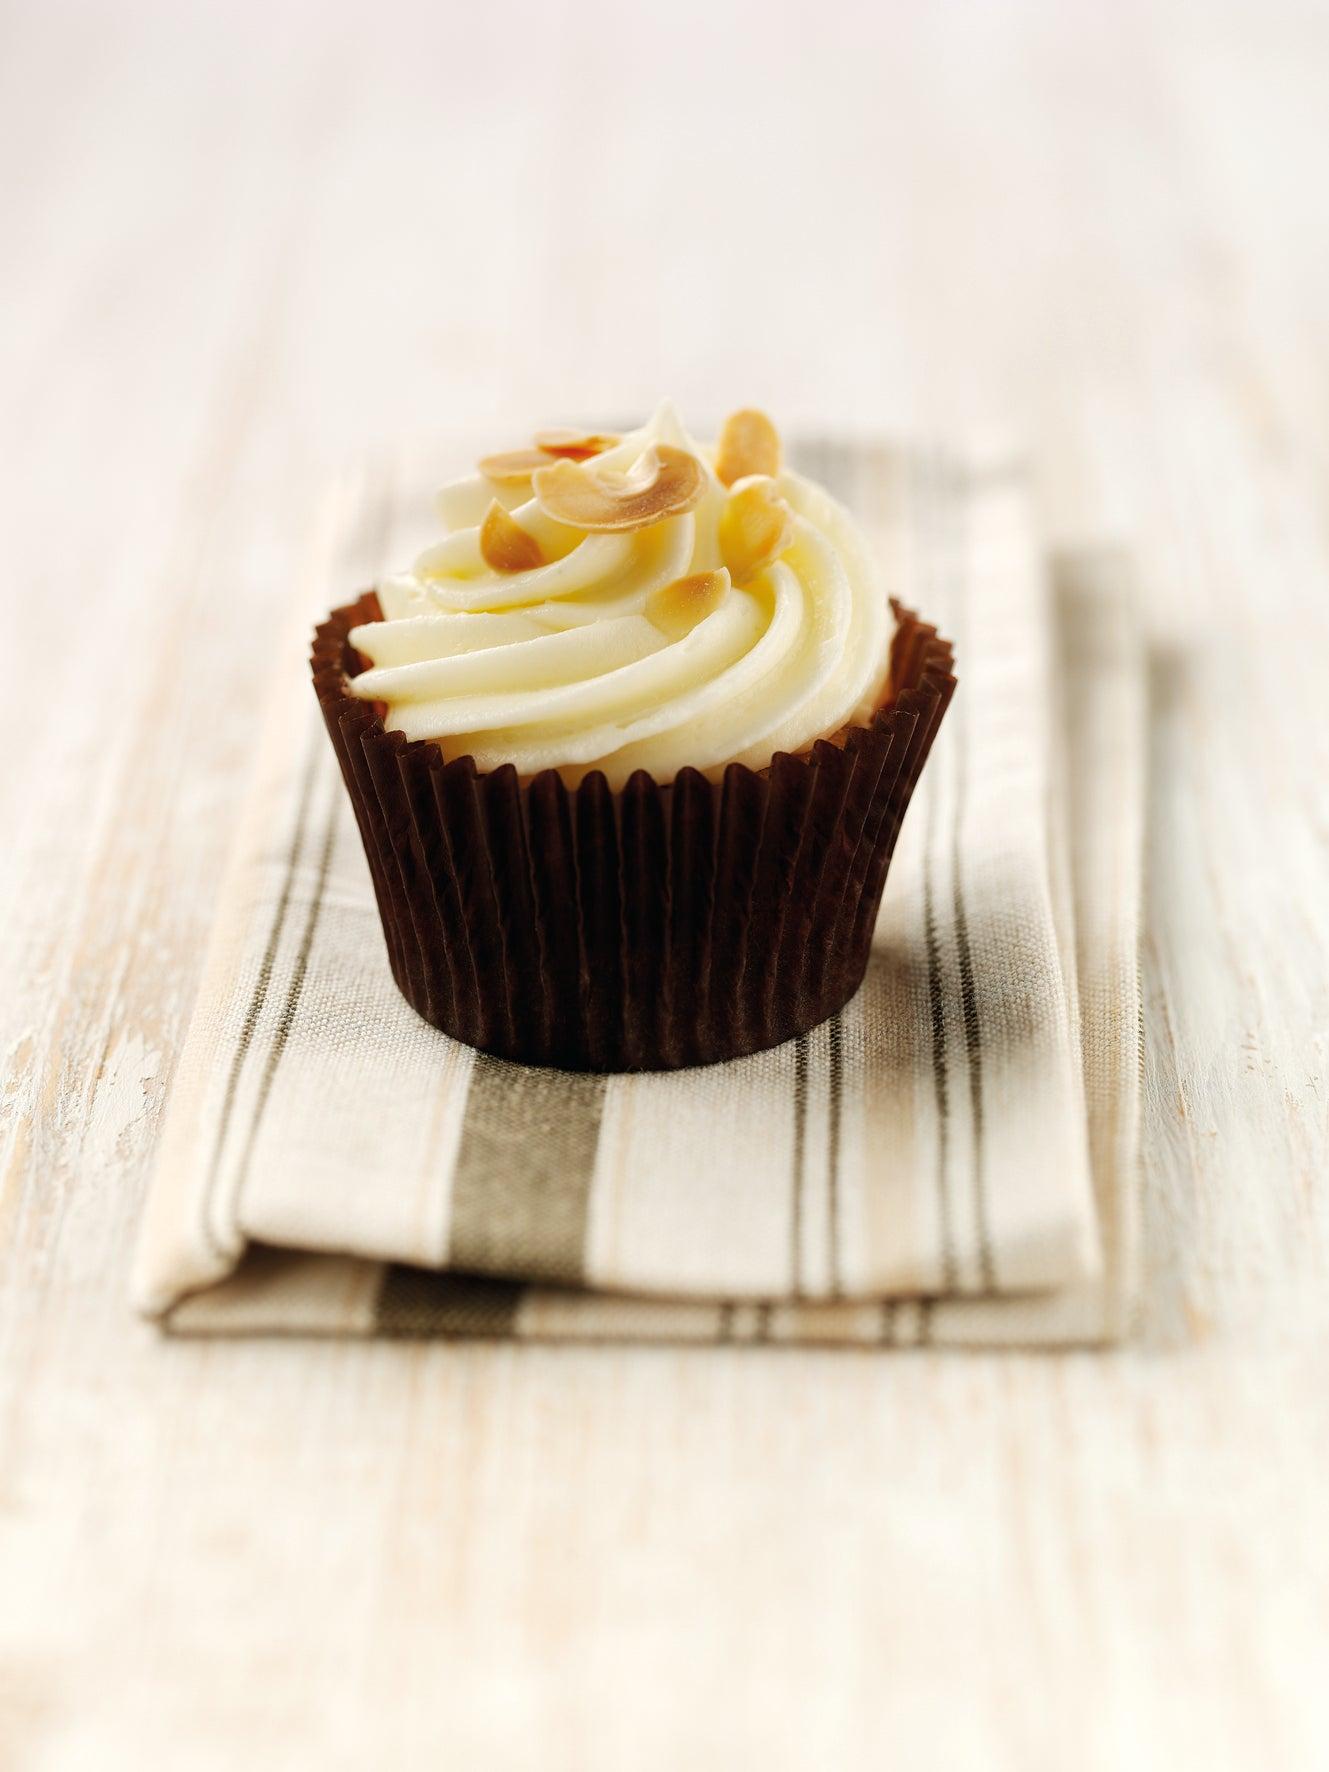 Nielsen-Massey-Almond-Cupcake.jpg